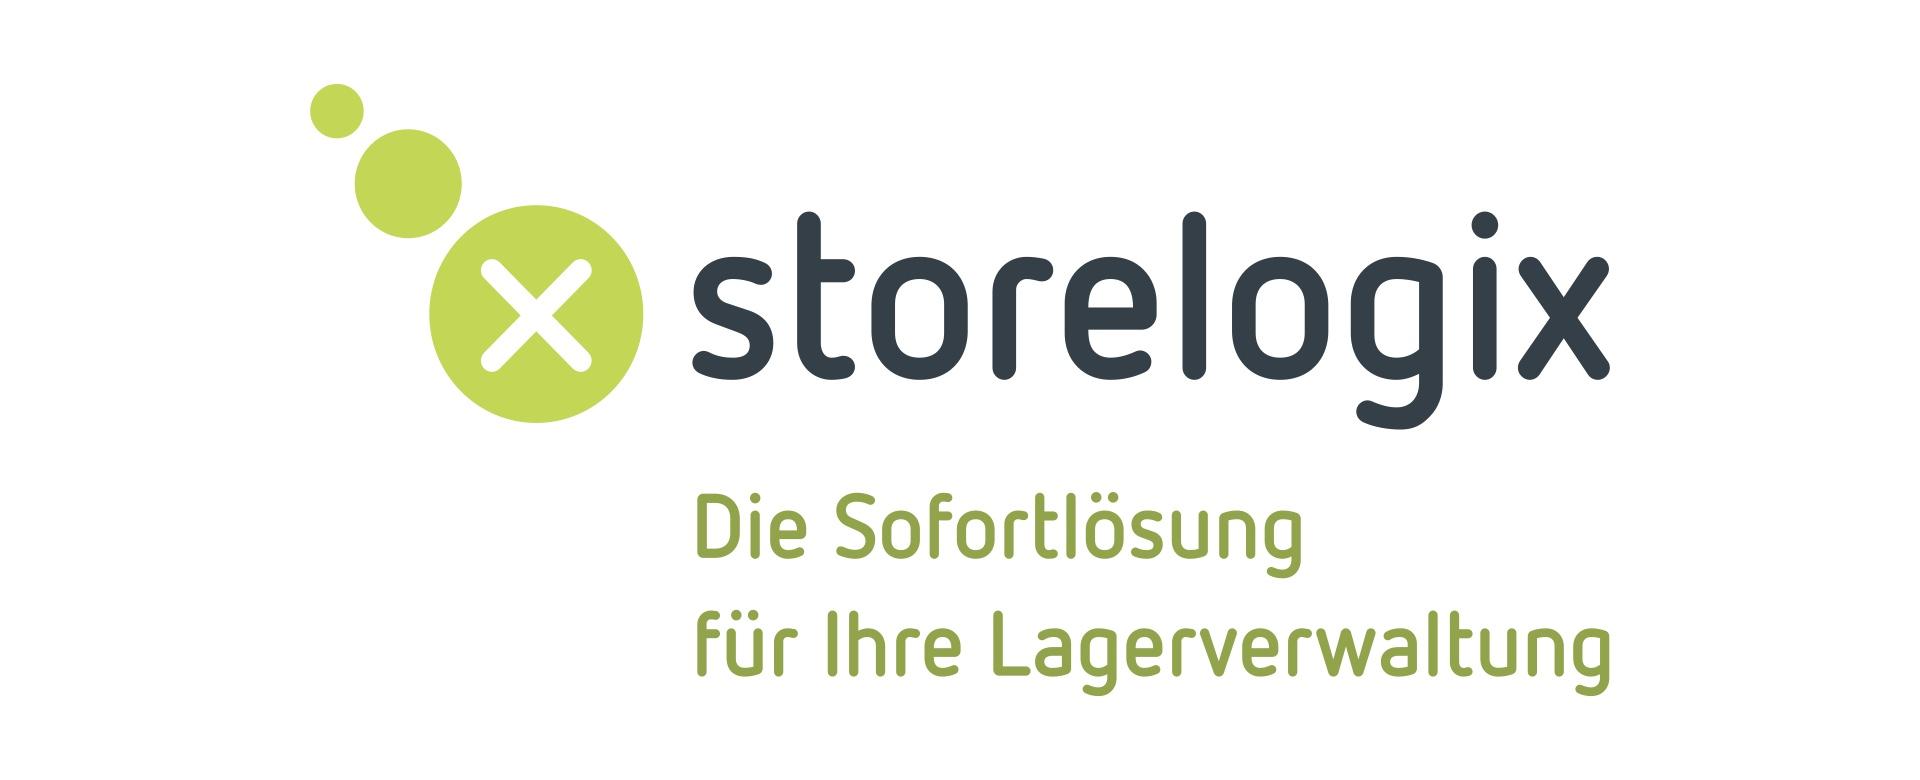 storelogix-Logo-mit-Claim-1920x780